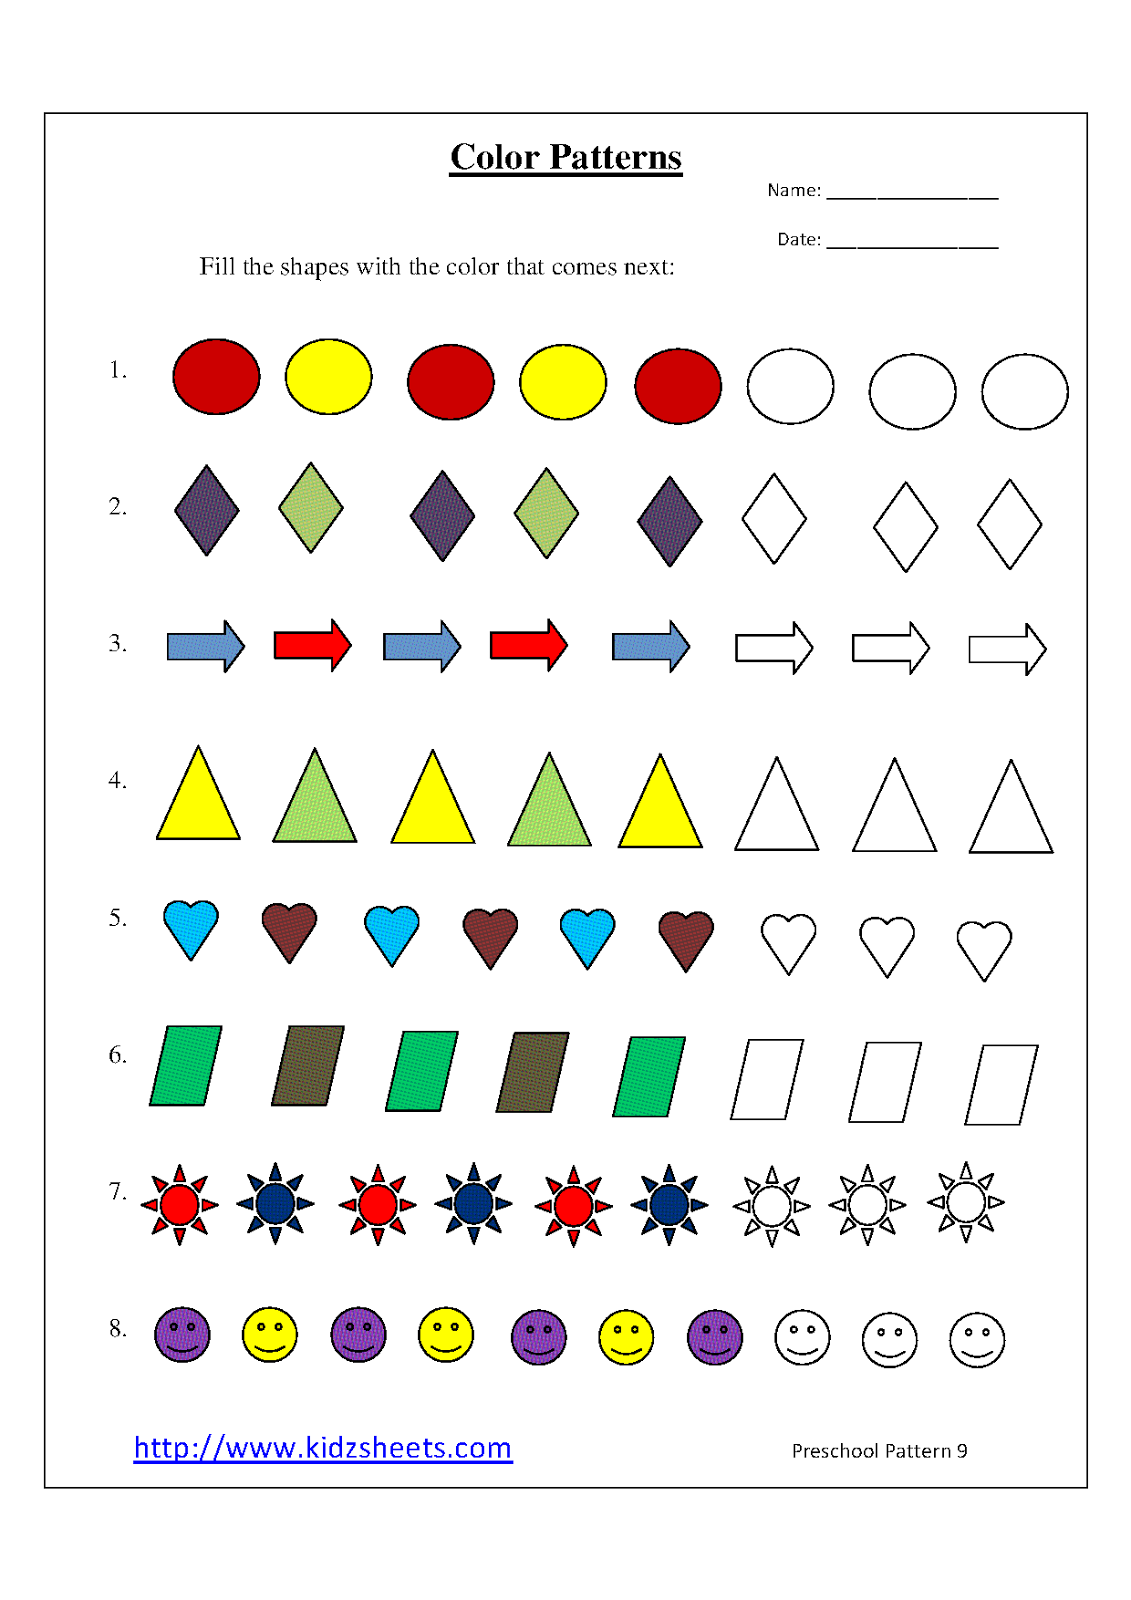 small resolution of Kidz Worksheets: Preschool Color Patterns Worksheet9